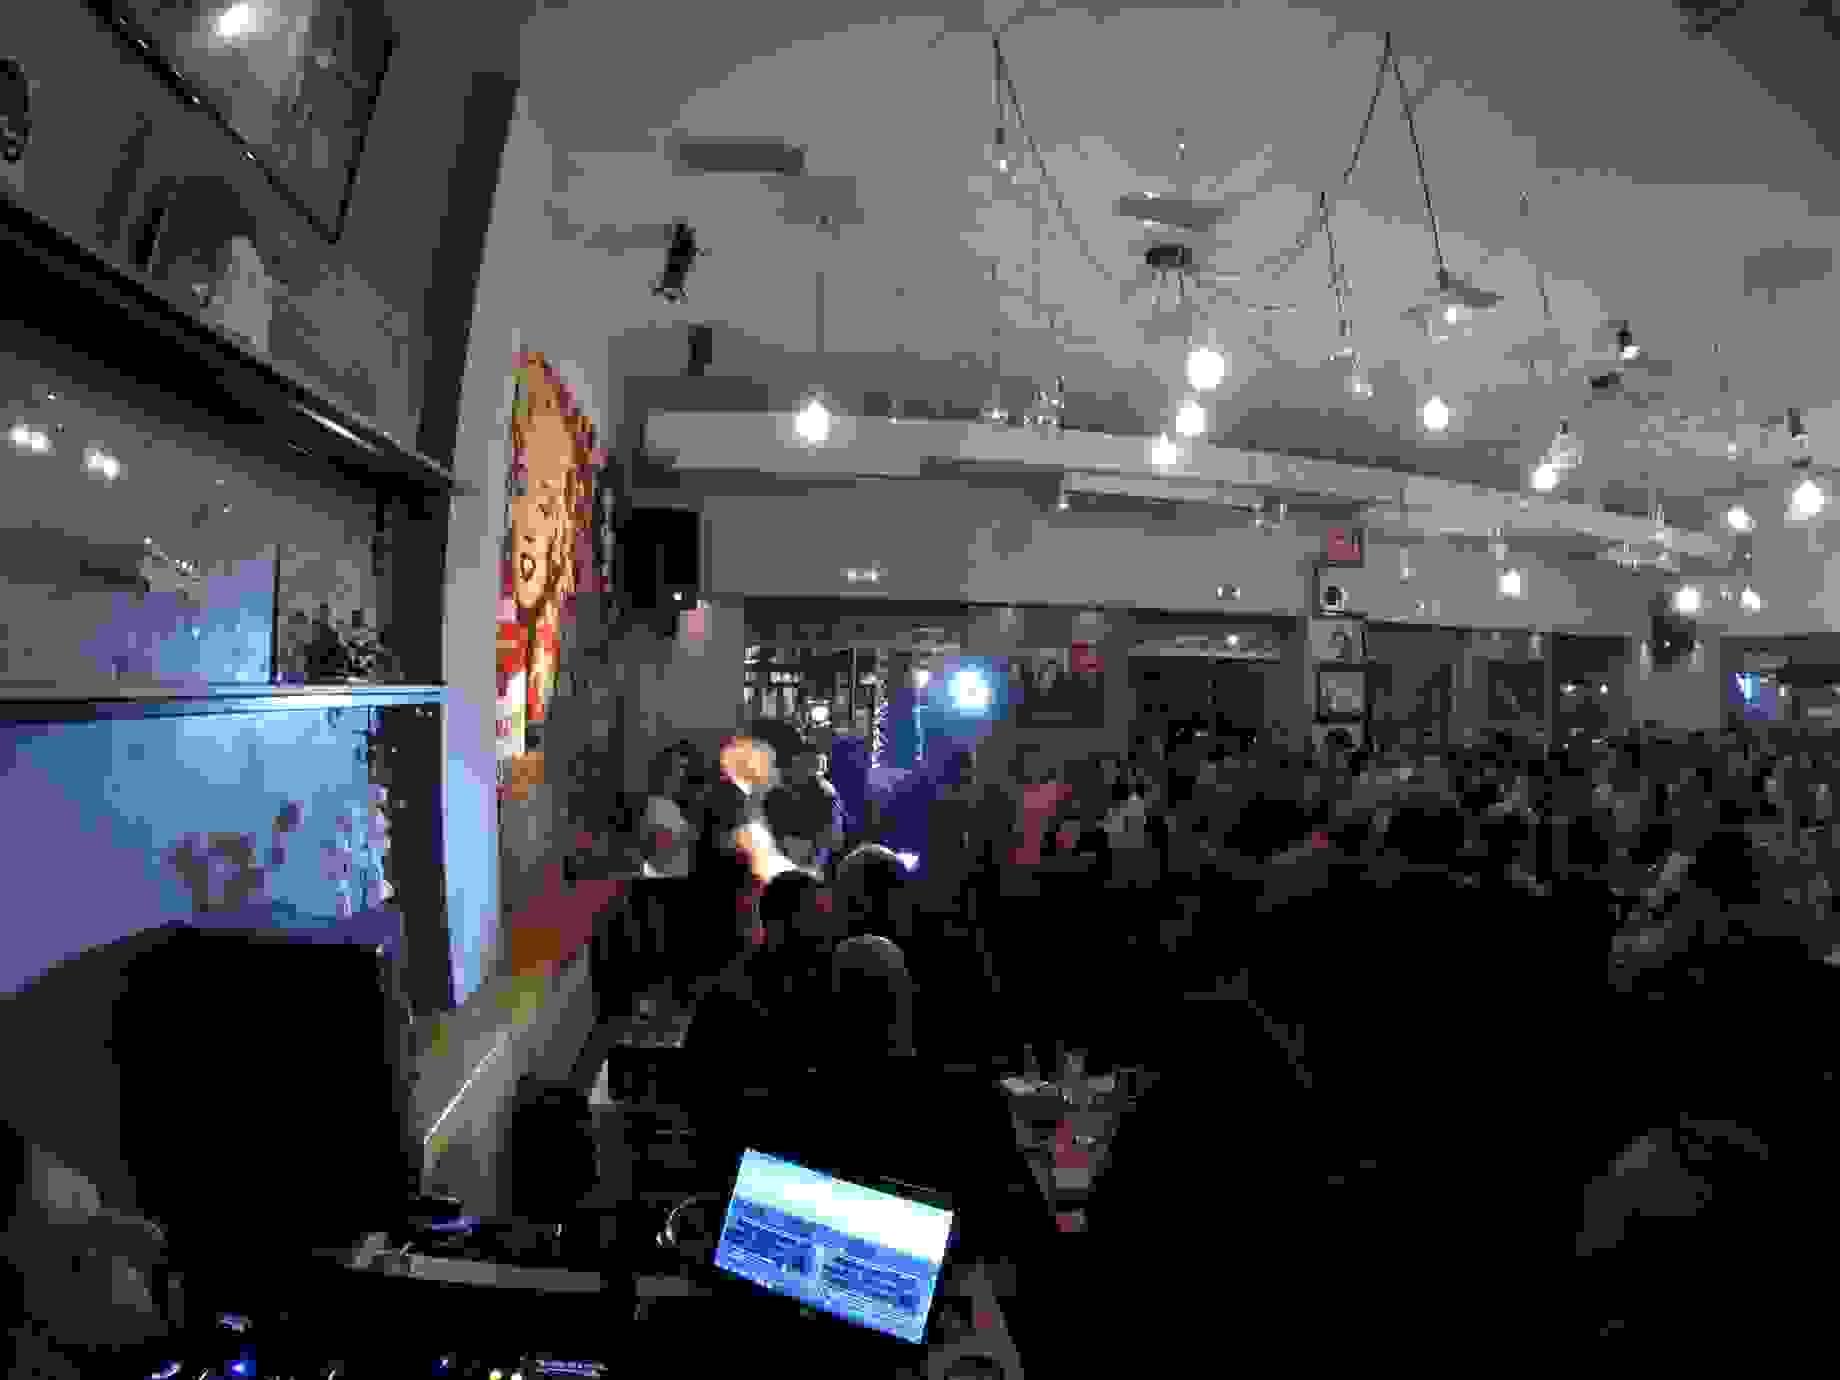 BEE'S KNEES: ΜΙΑ ΔΙΑΦΟΡΕΤΙΚΗ LIVE ΒΡΑΔΙΑ ΜΕ ΤΟΝ ΣΤΕΛΙΟ ΜΑΓΑΛΙΟ (βιντεο)